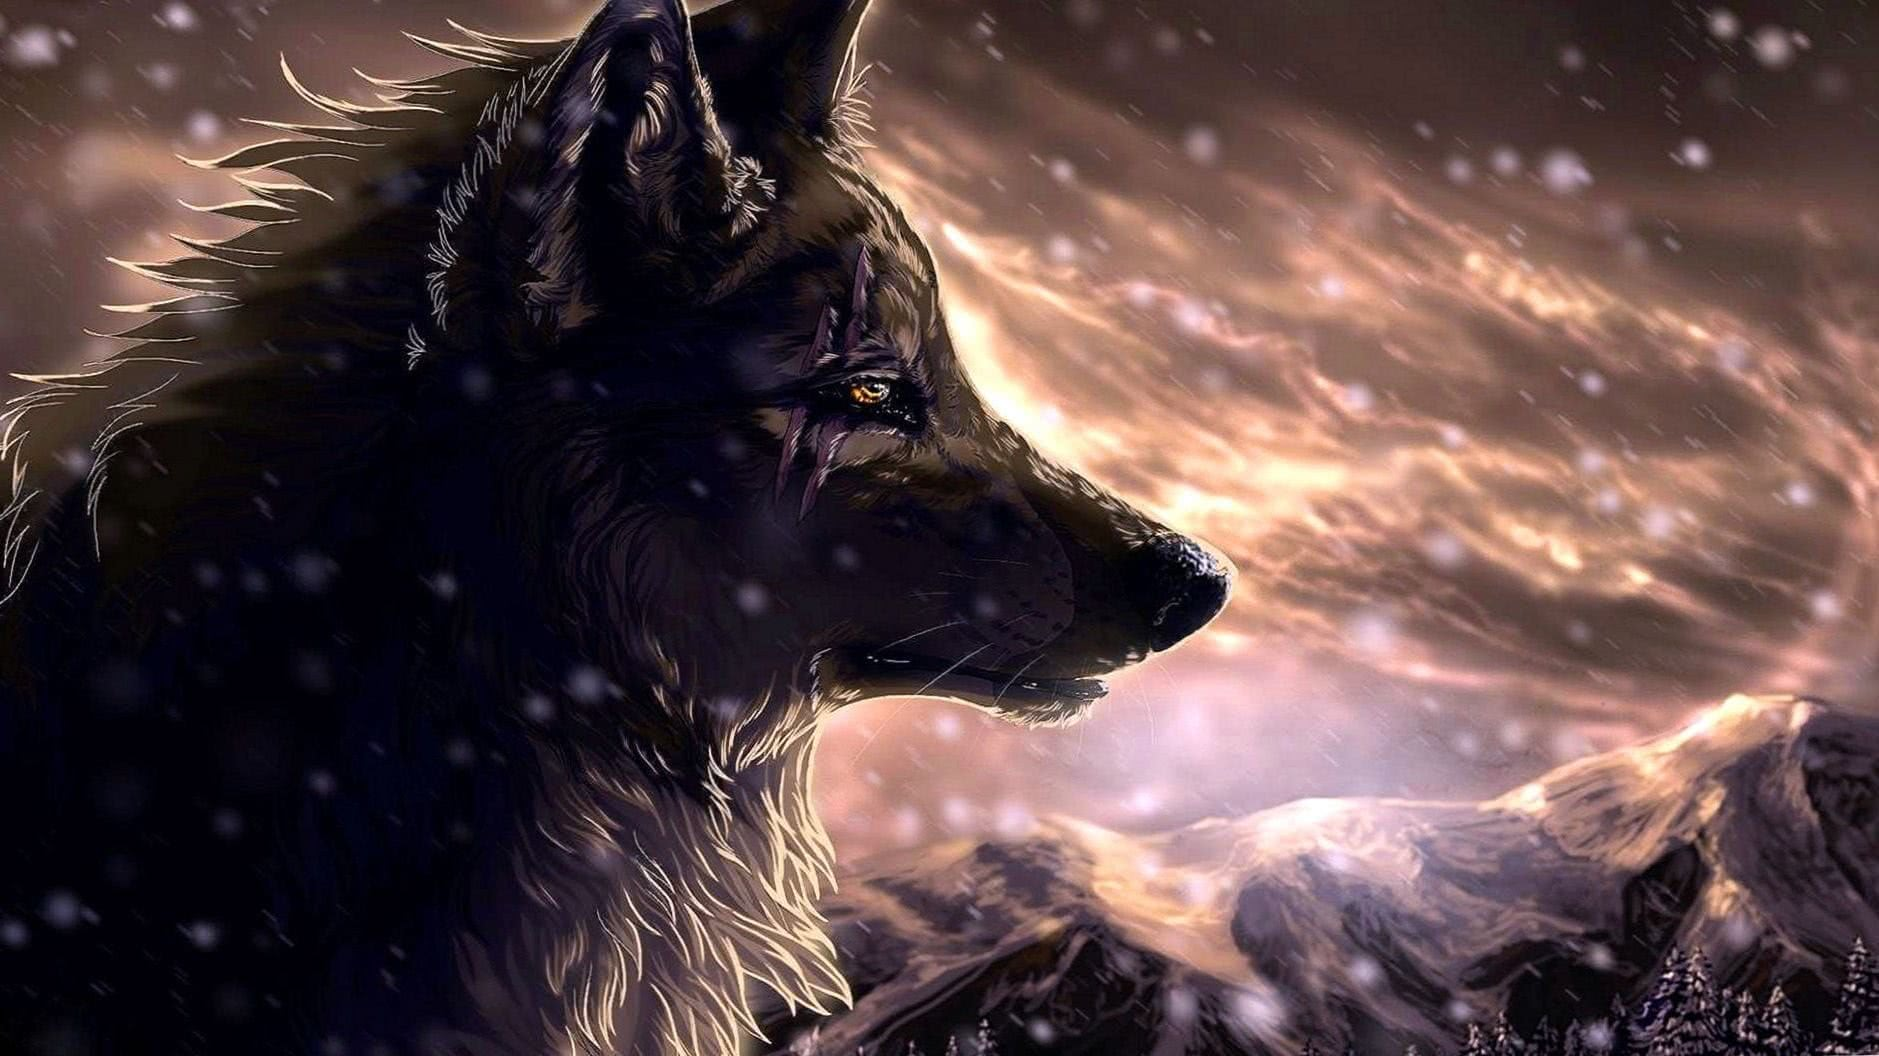 Desktop Wallpapers Of Wolves